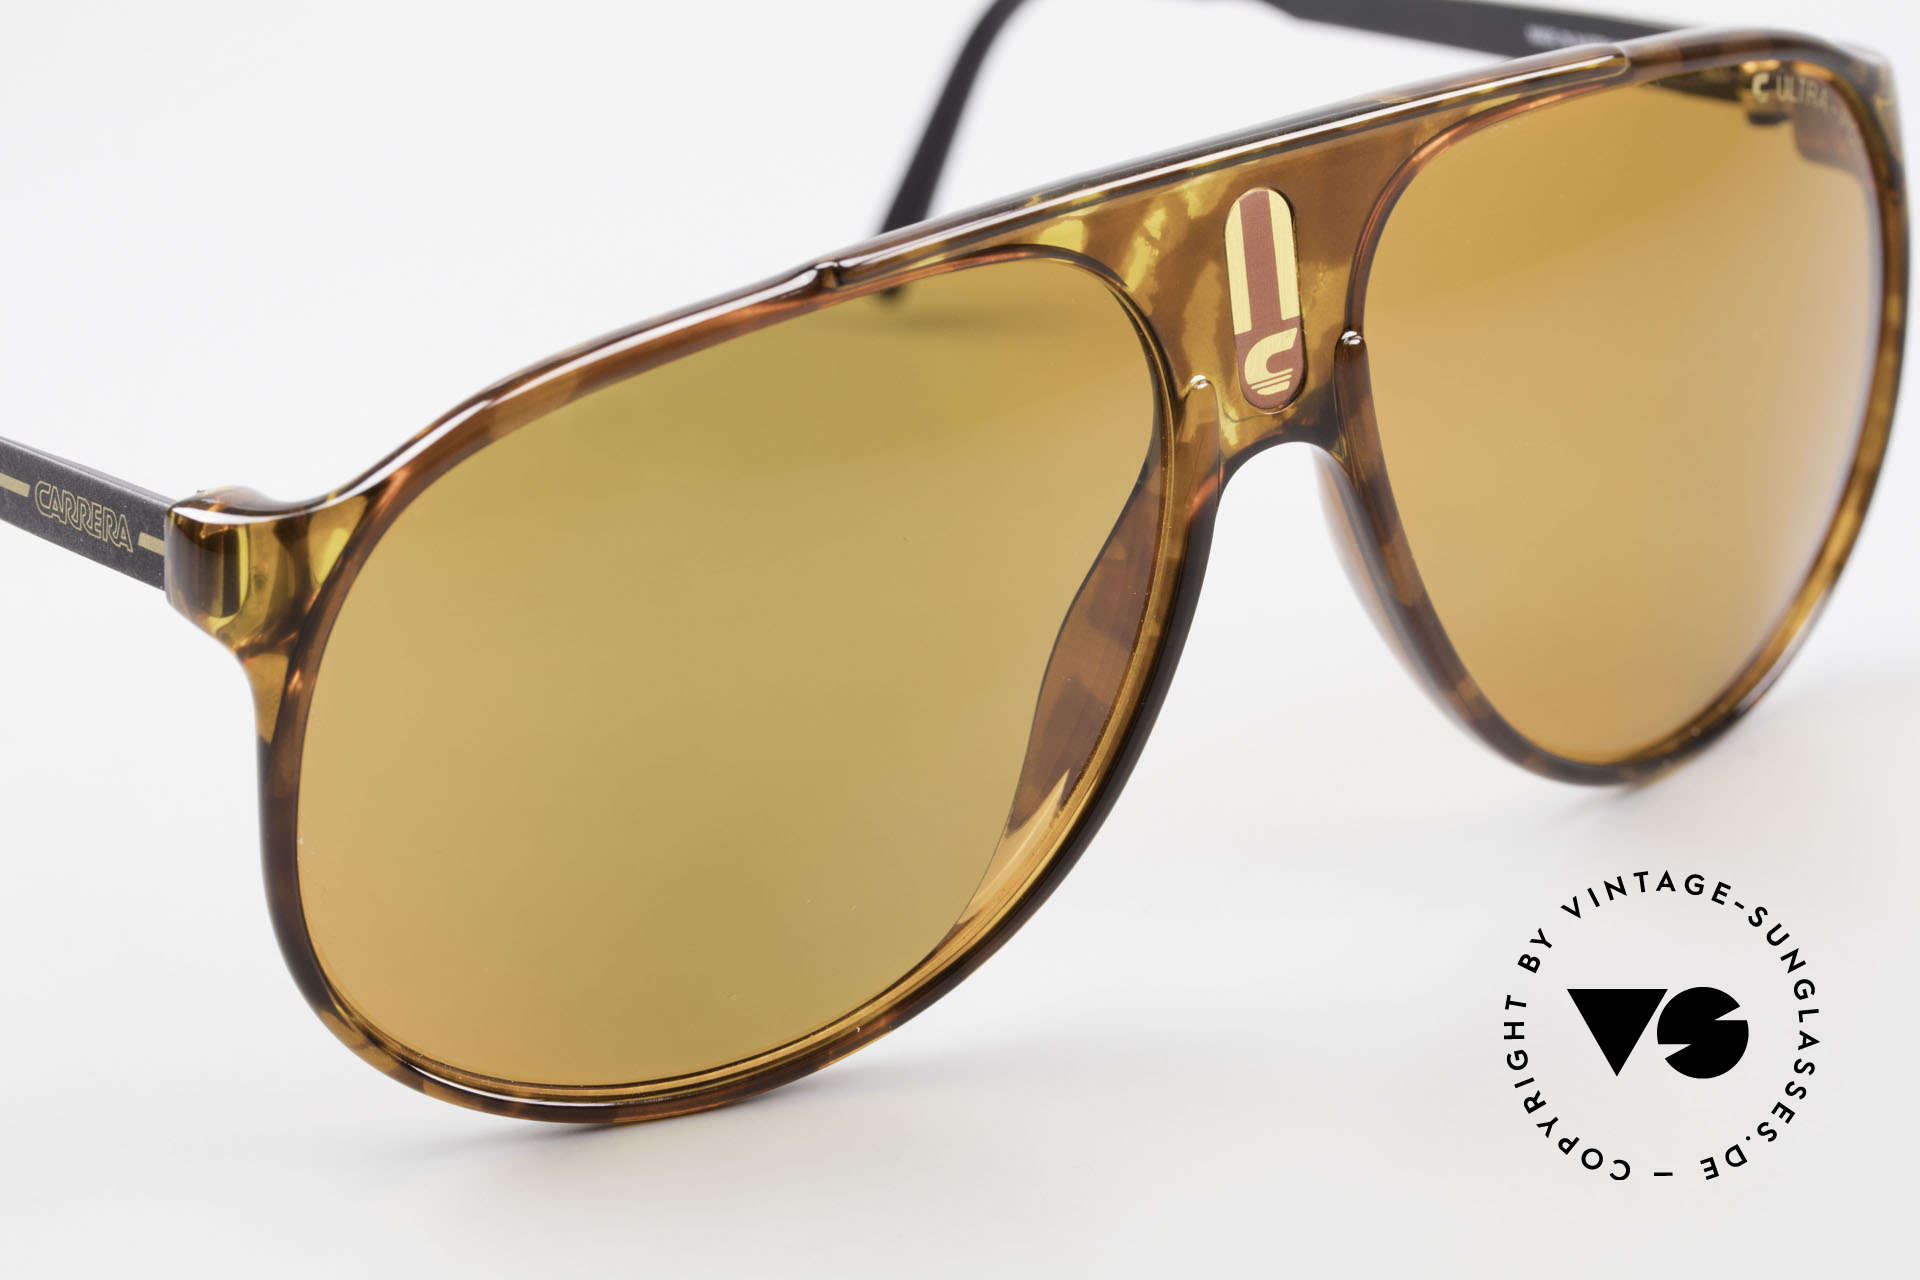 Carrera 5424 80's Sunglasses Polarized Lens, C Ultra-Pol POLARIZED lenses, 100% UV protection, Made for Men